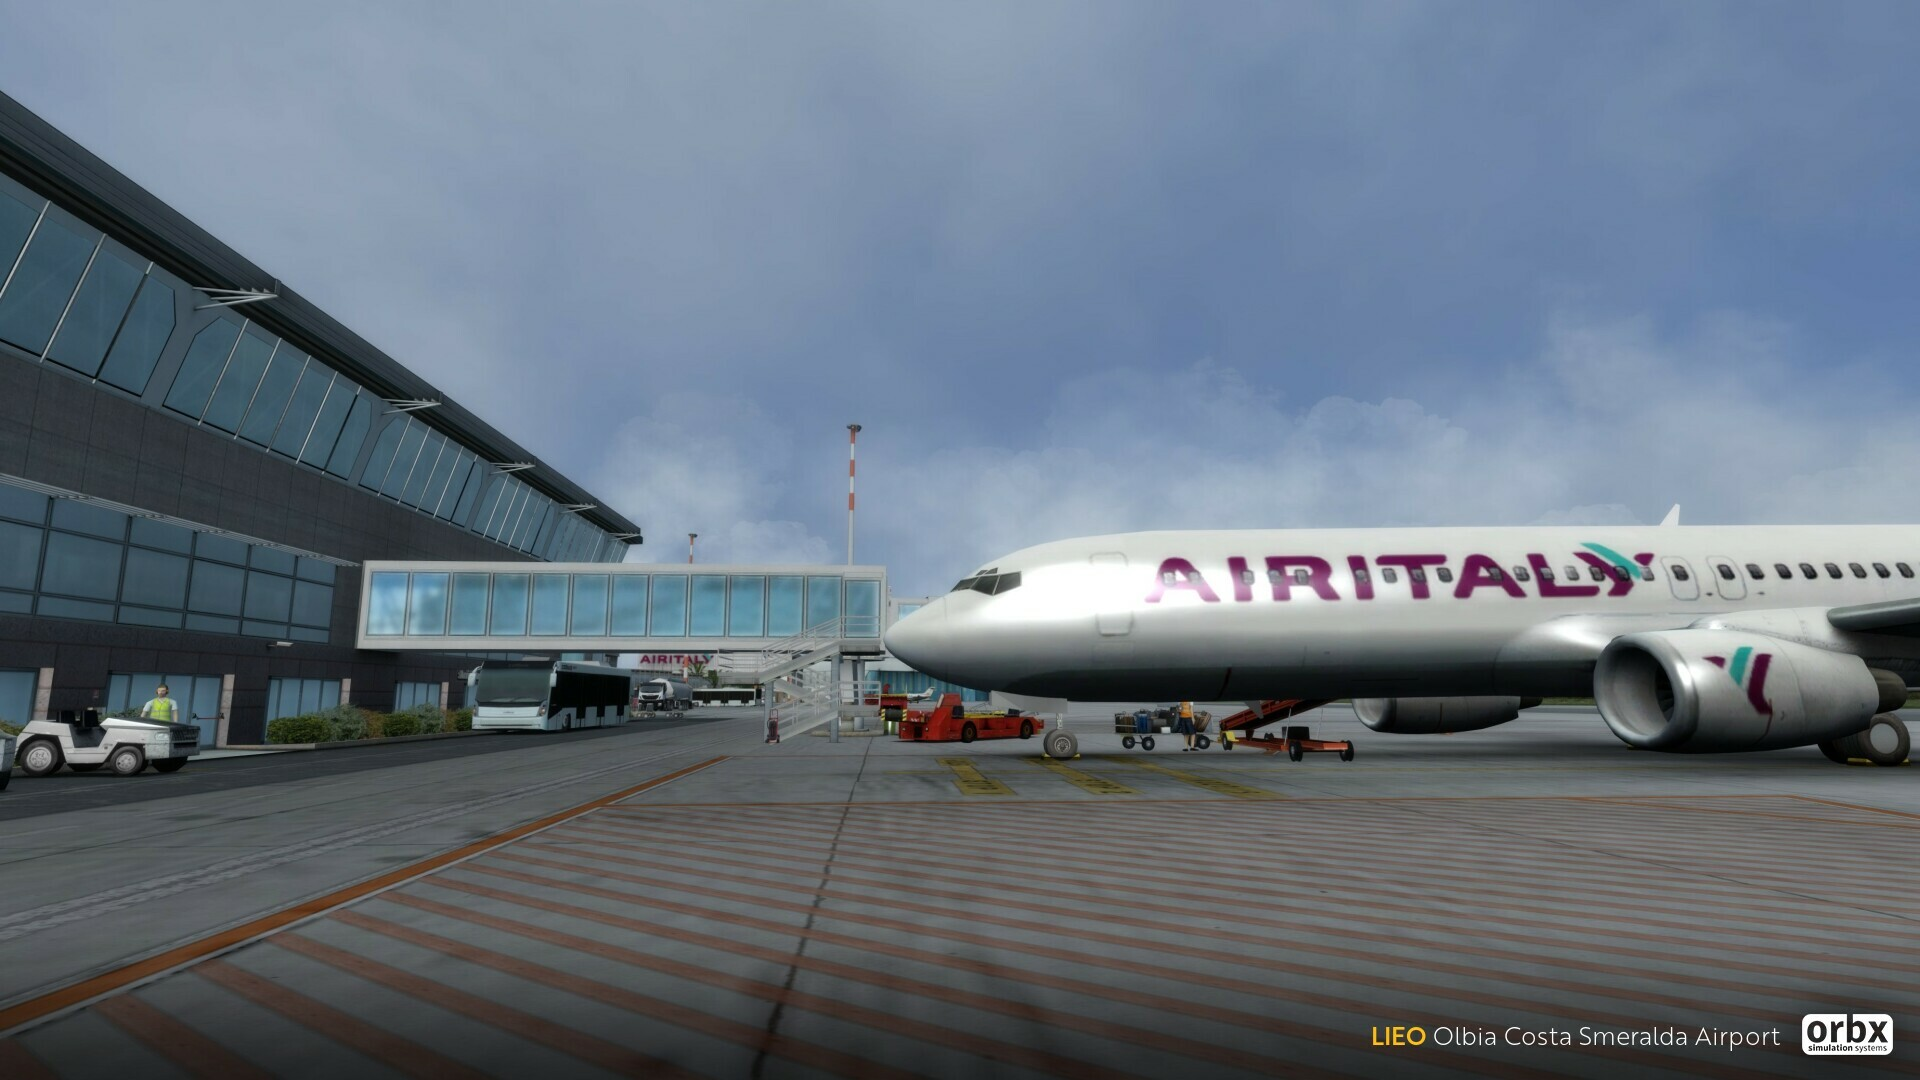 LIEO Olbia Costa Smeralda Airport